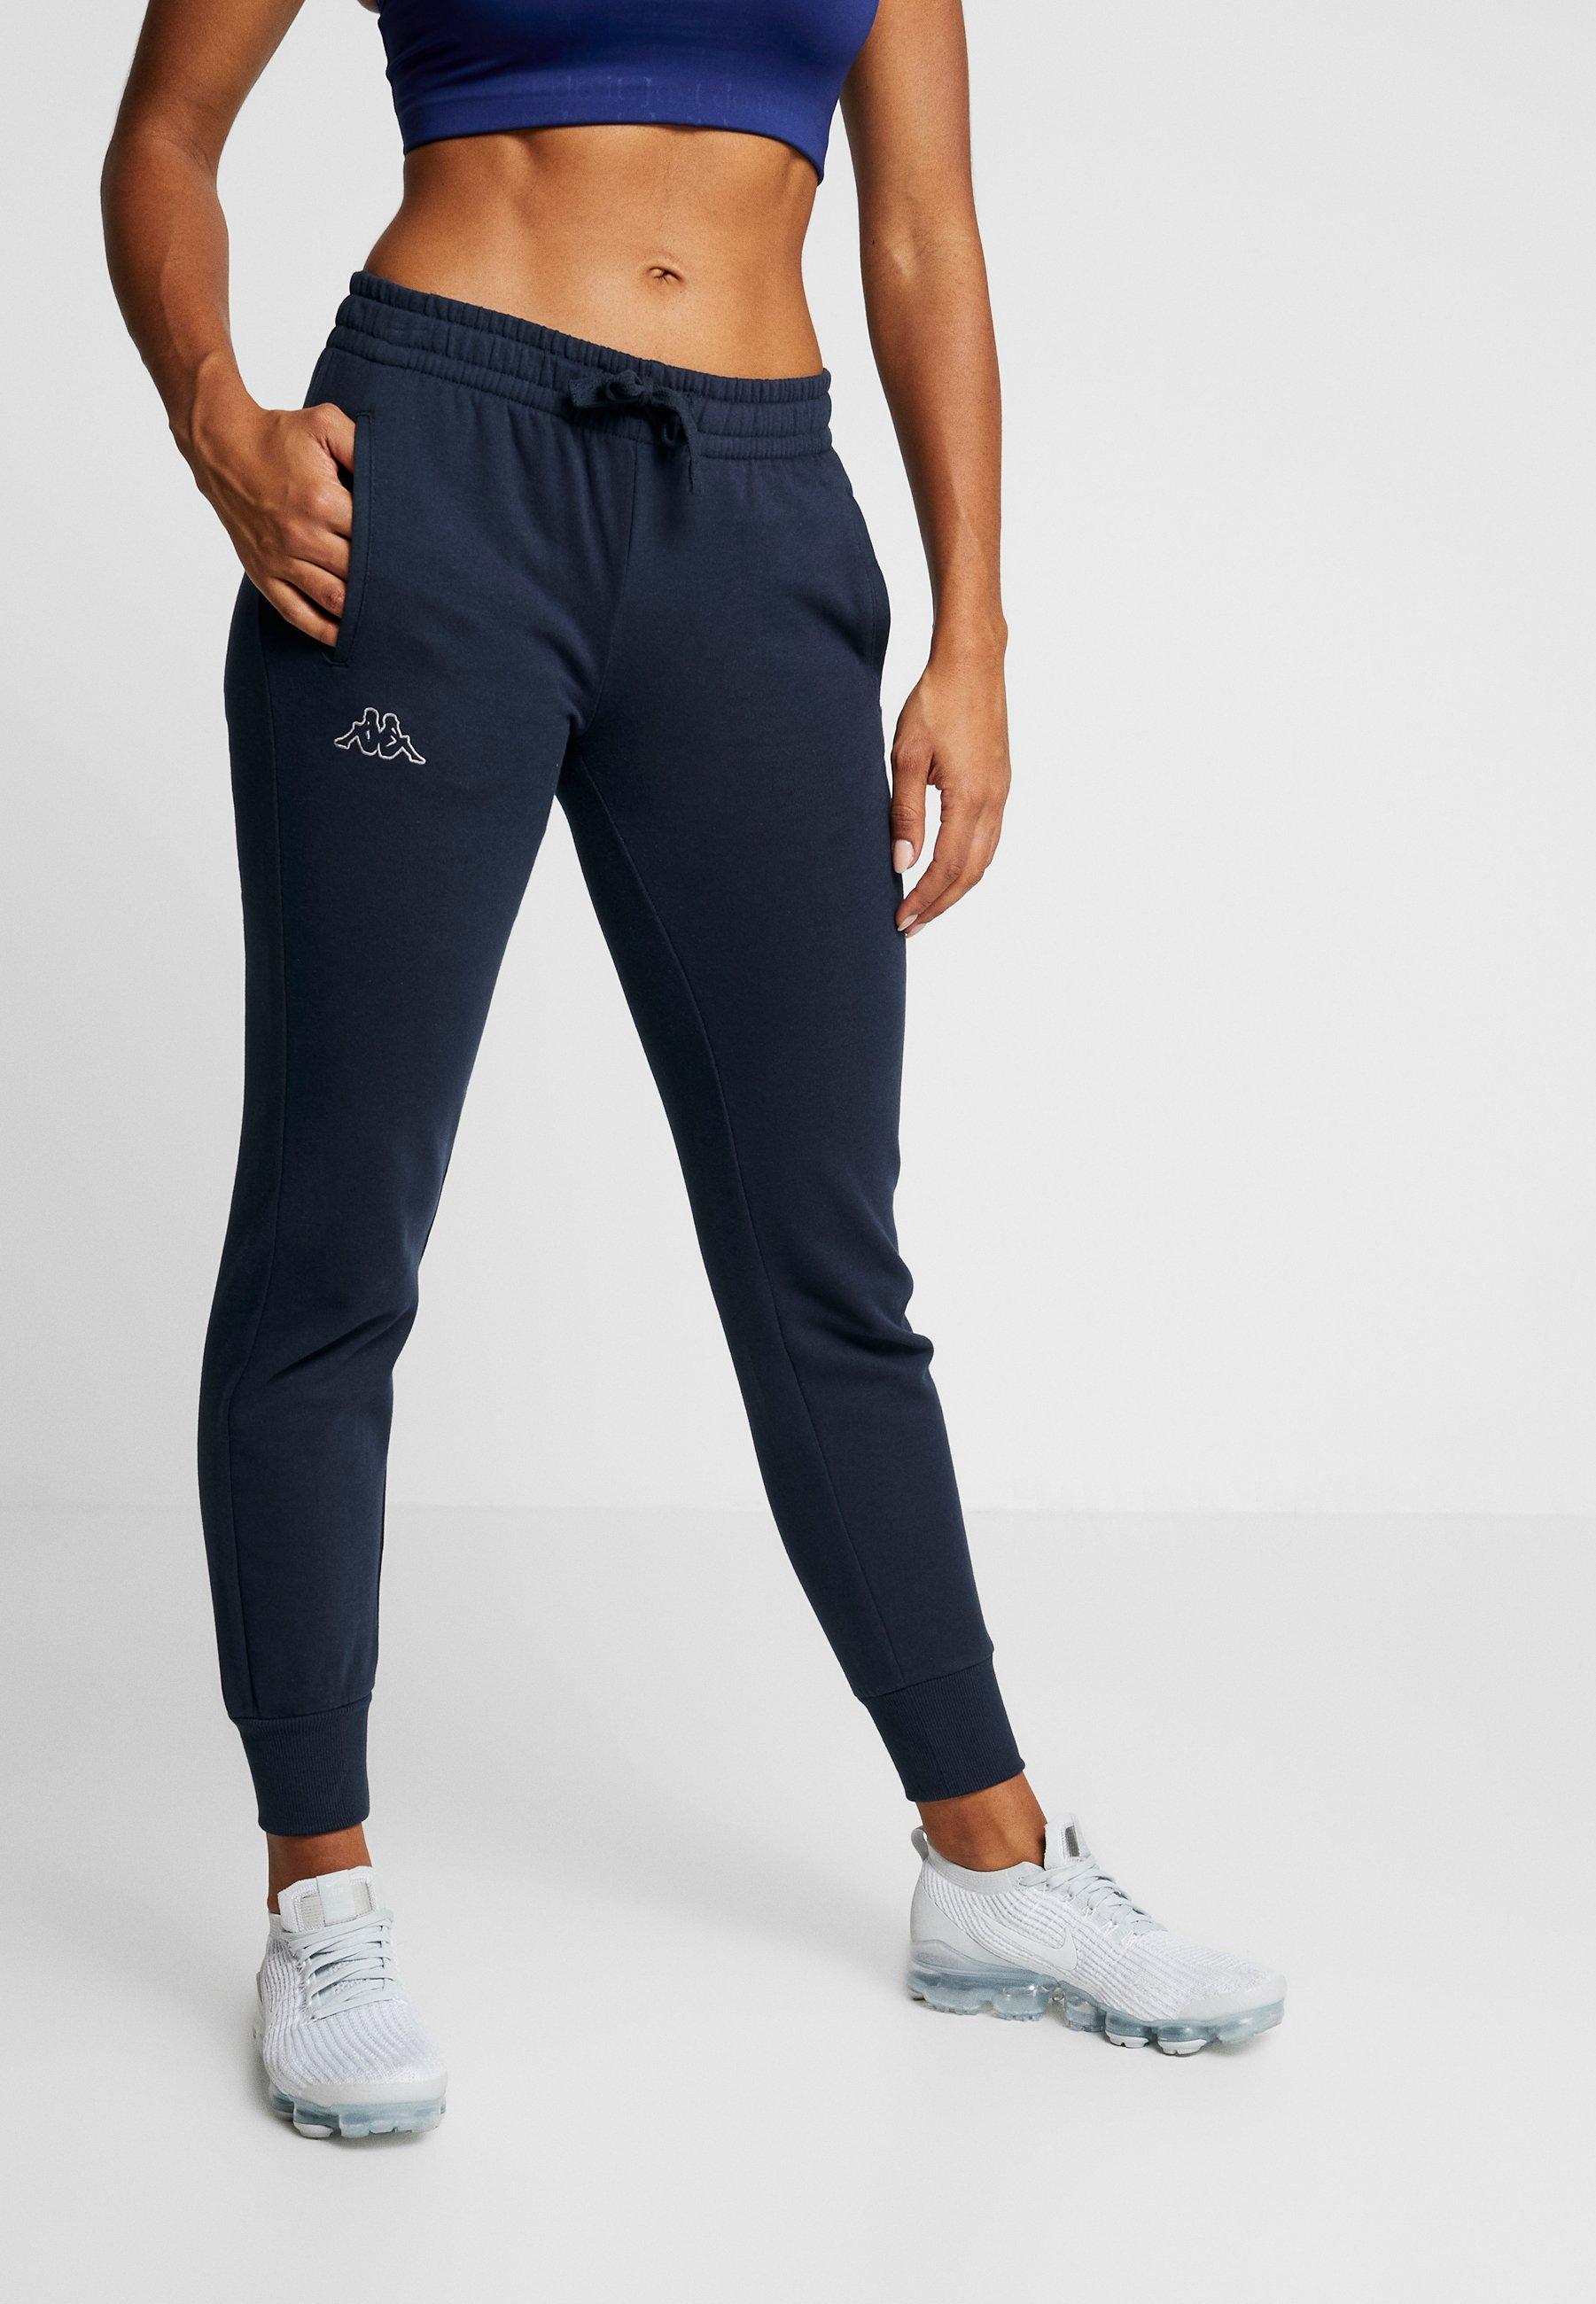 Damen TAIMA PANTS WOMEN - Jogginghose